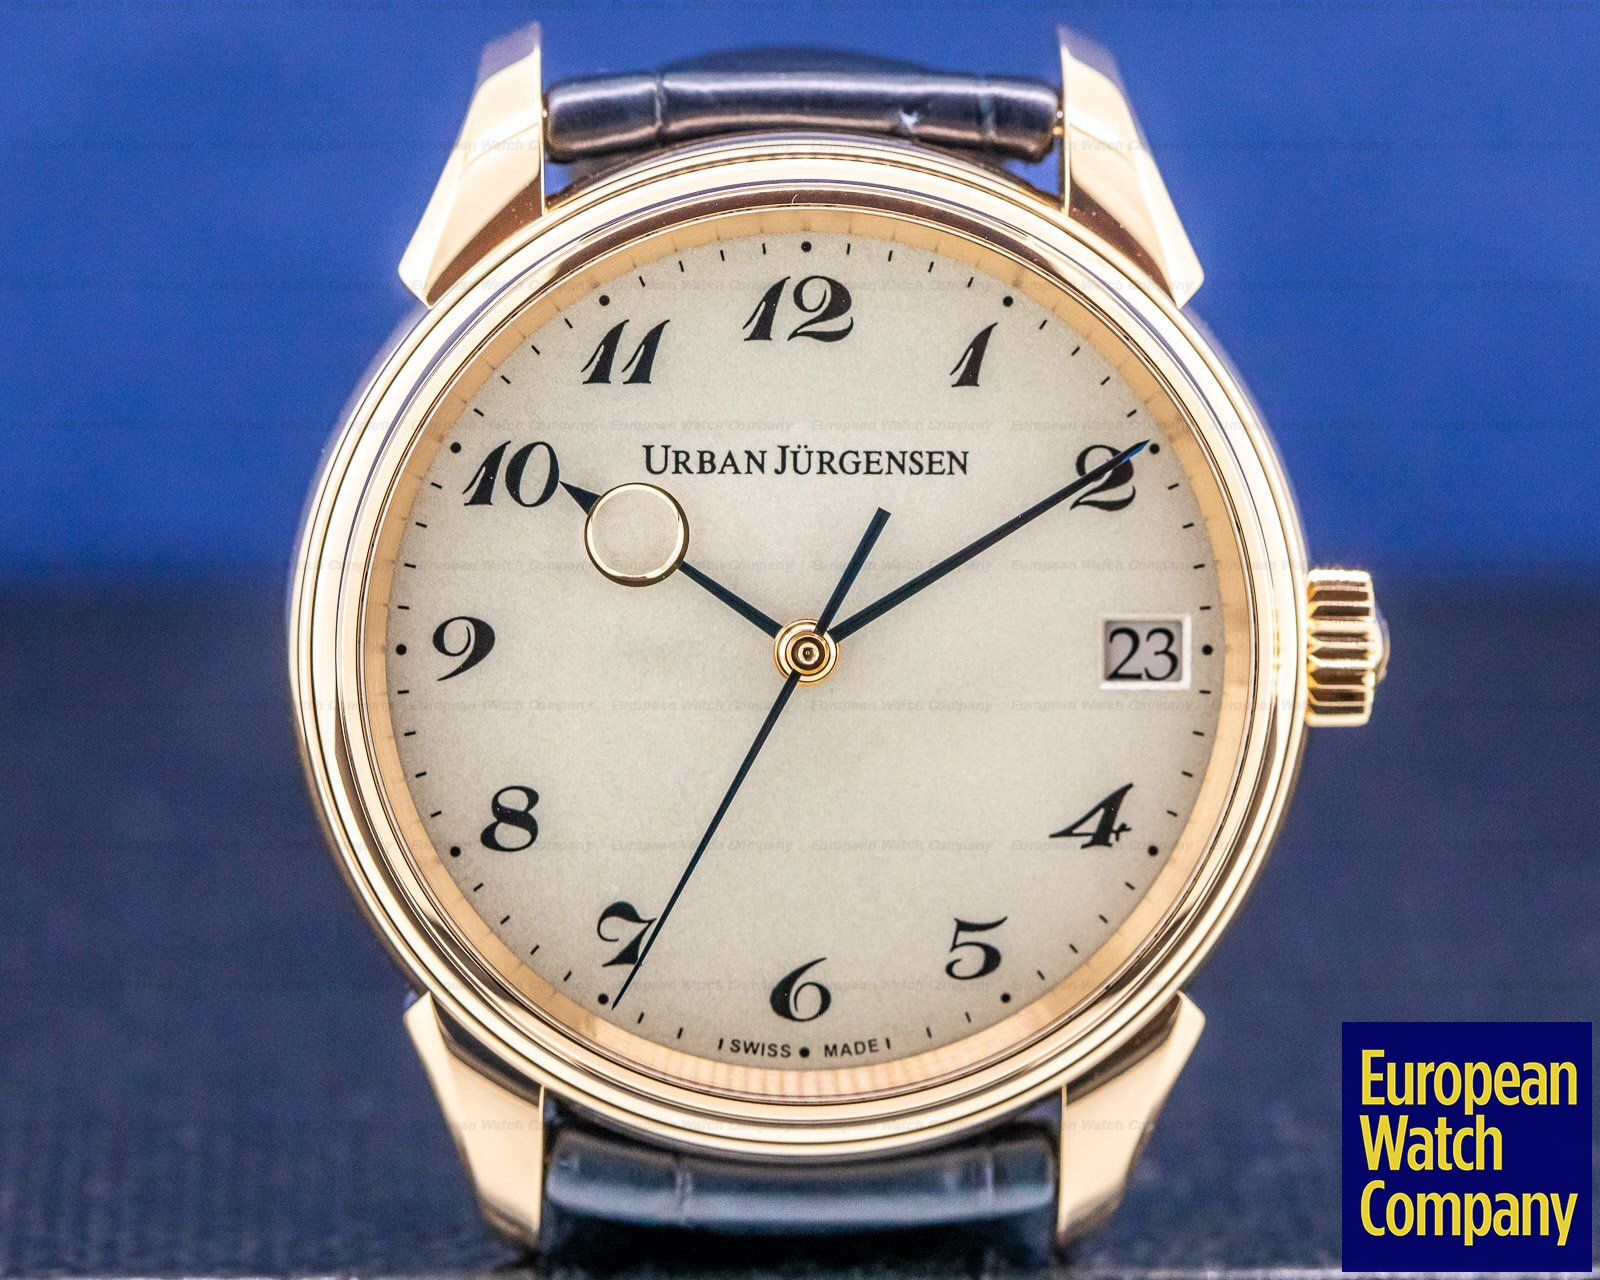 Urban Jurgensen 2240 RG Jules Collection 2240RG 18k Rose Gold / Breguet Numerals